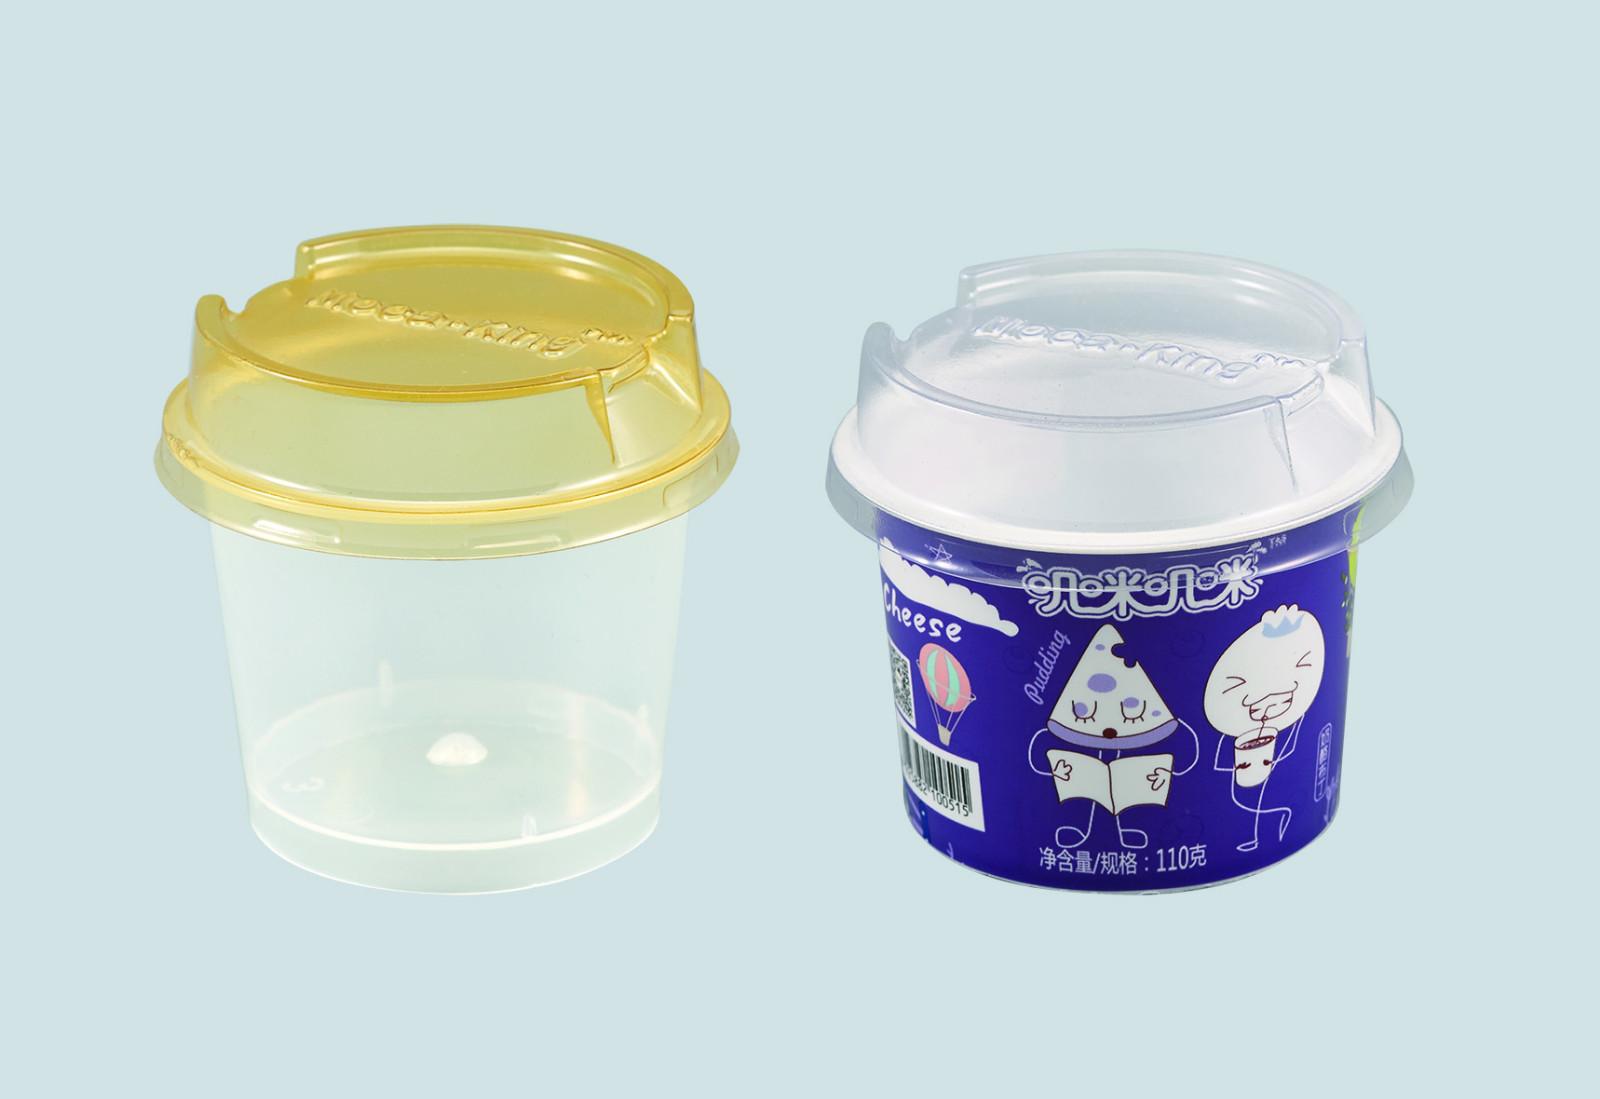 HoChong-Find Plastic Milkshake Dessert Trifle Ice Cream Cup Cartoon Baby Label-1